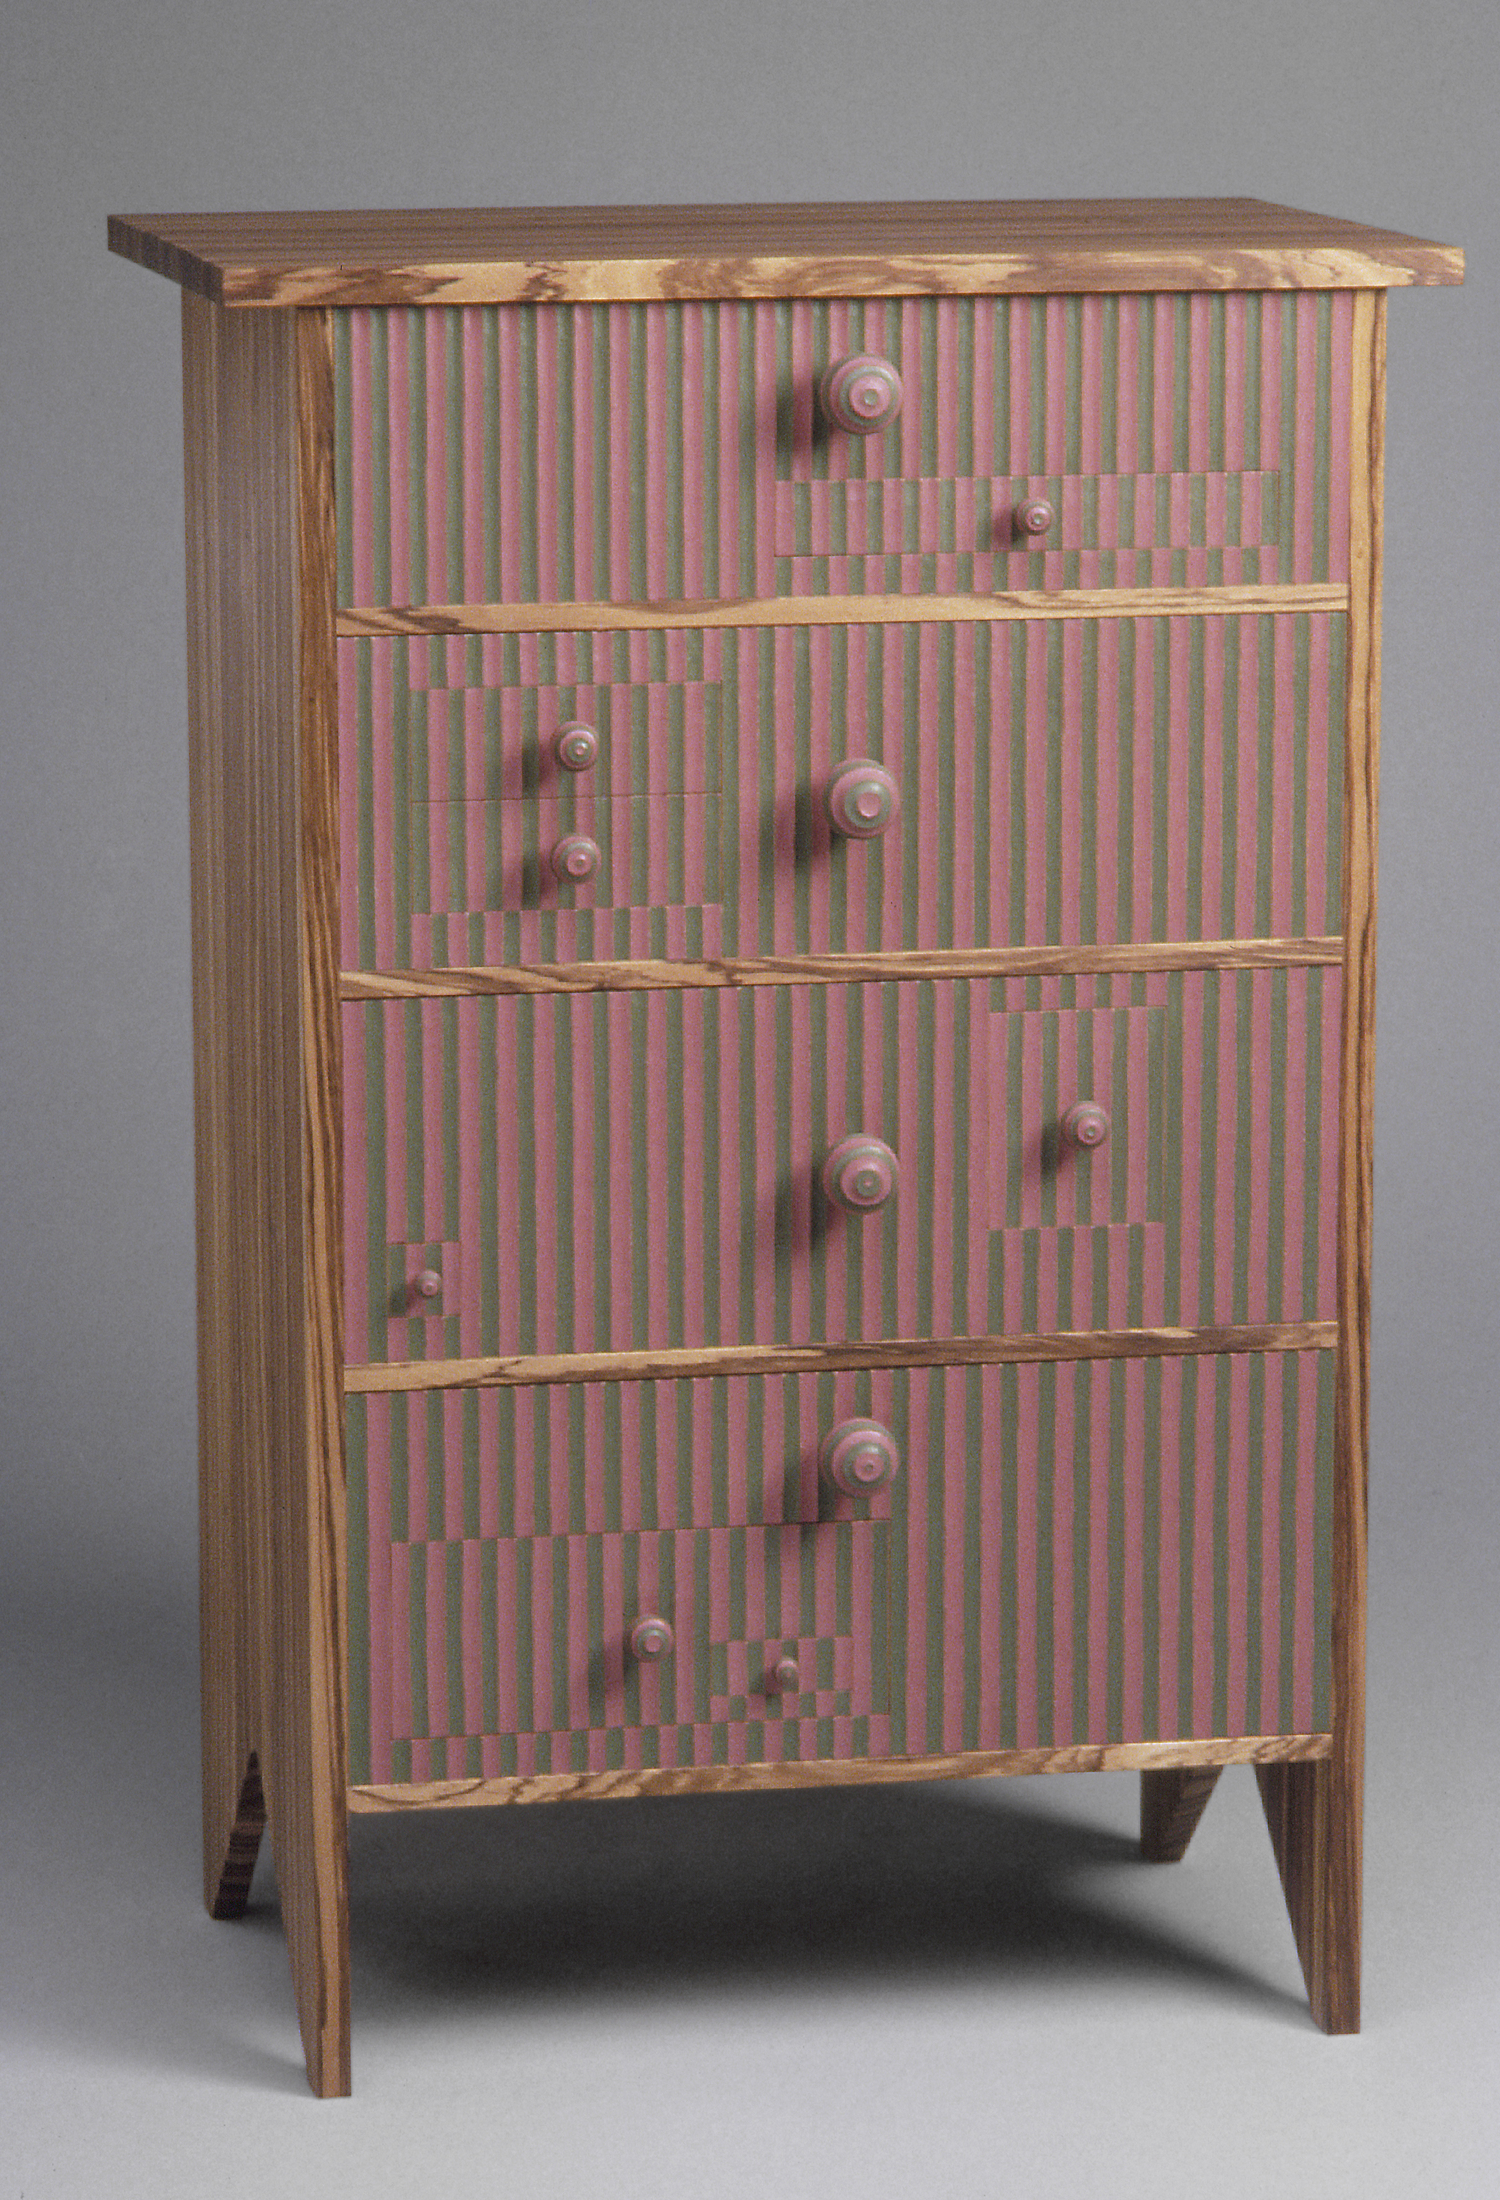 More Multiple Complications I 1995 I wood, paint I 50 x 34 x 21